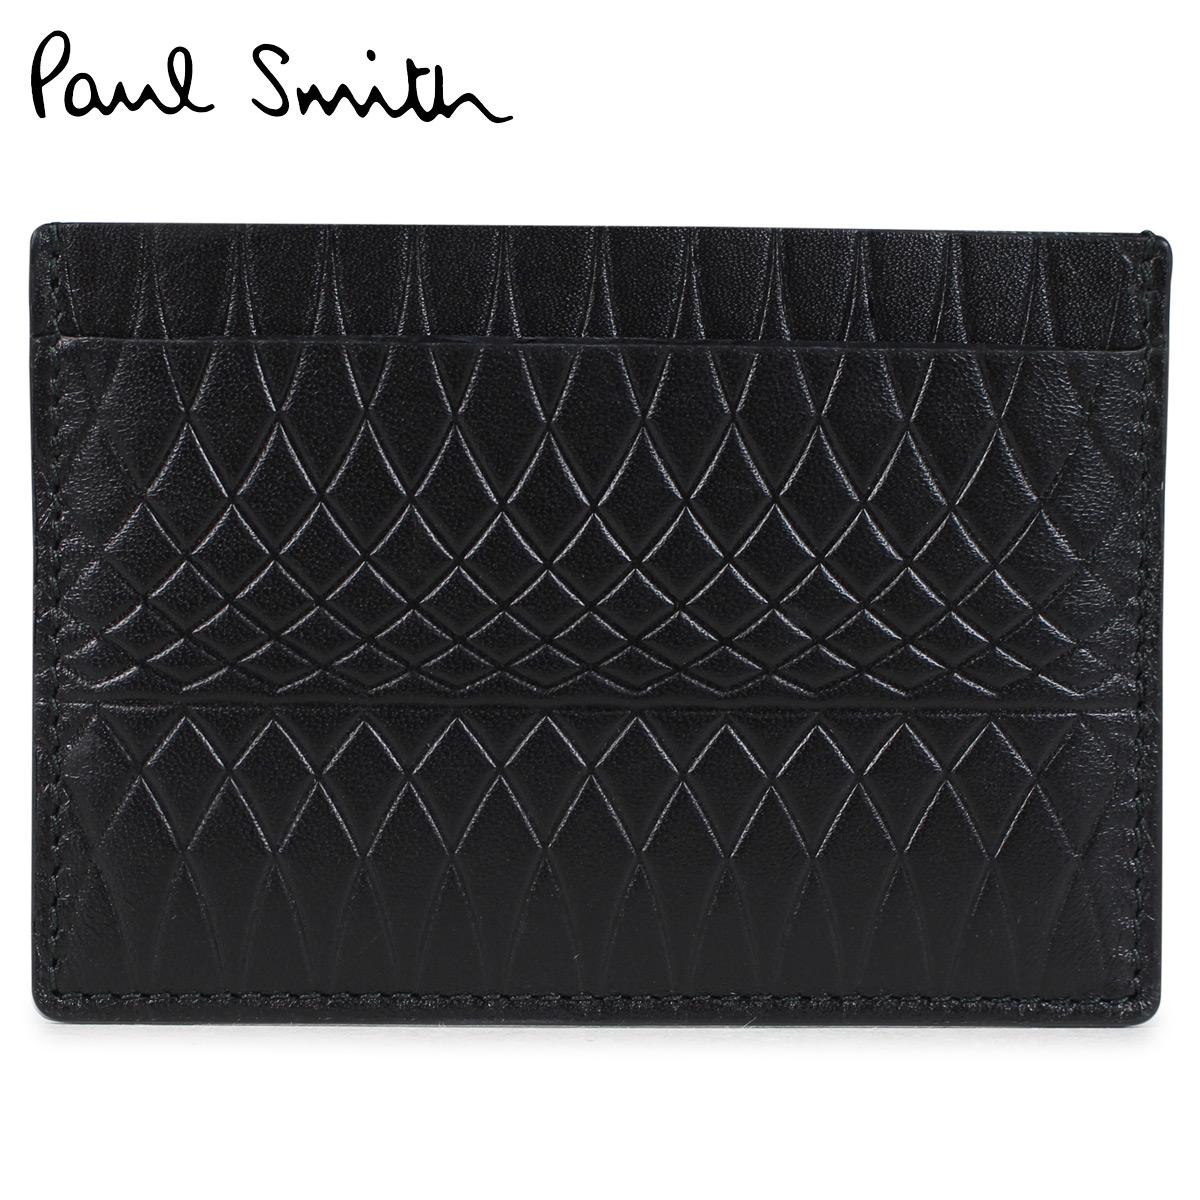 Paul Smith MENS WALLET CREDIT CARD HOLDER NO.9 ポールスミス 名刺入れ メンズ カードケース ブラック ARXA 4768 W787